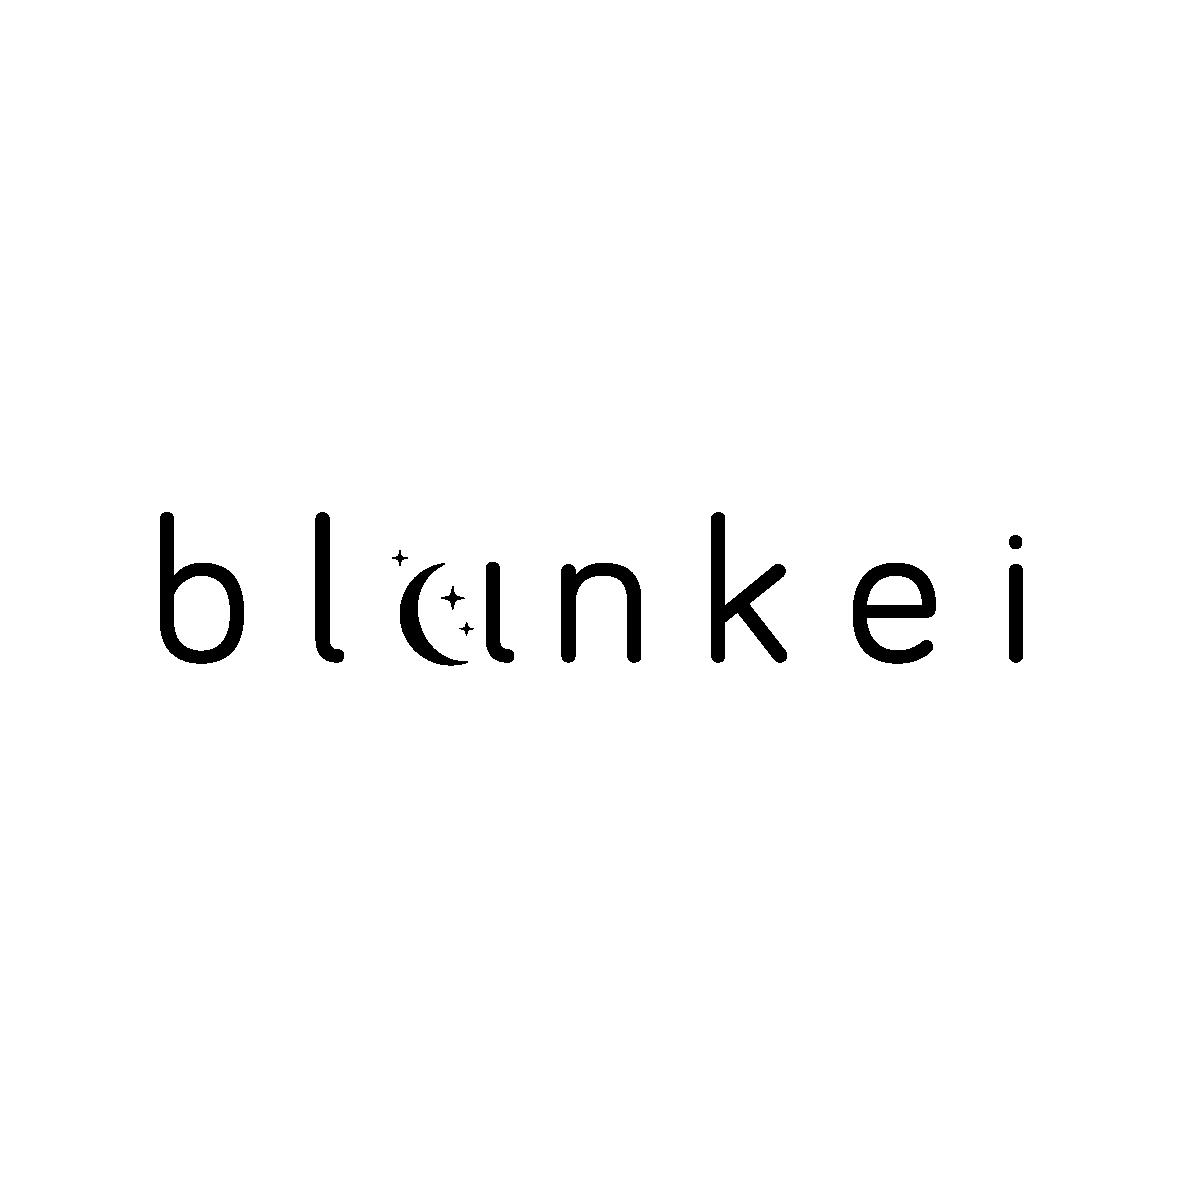 blankei